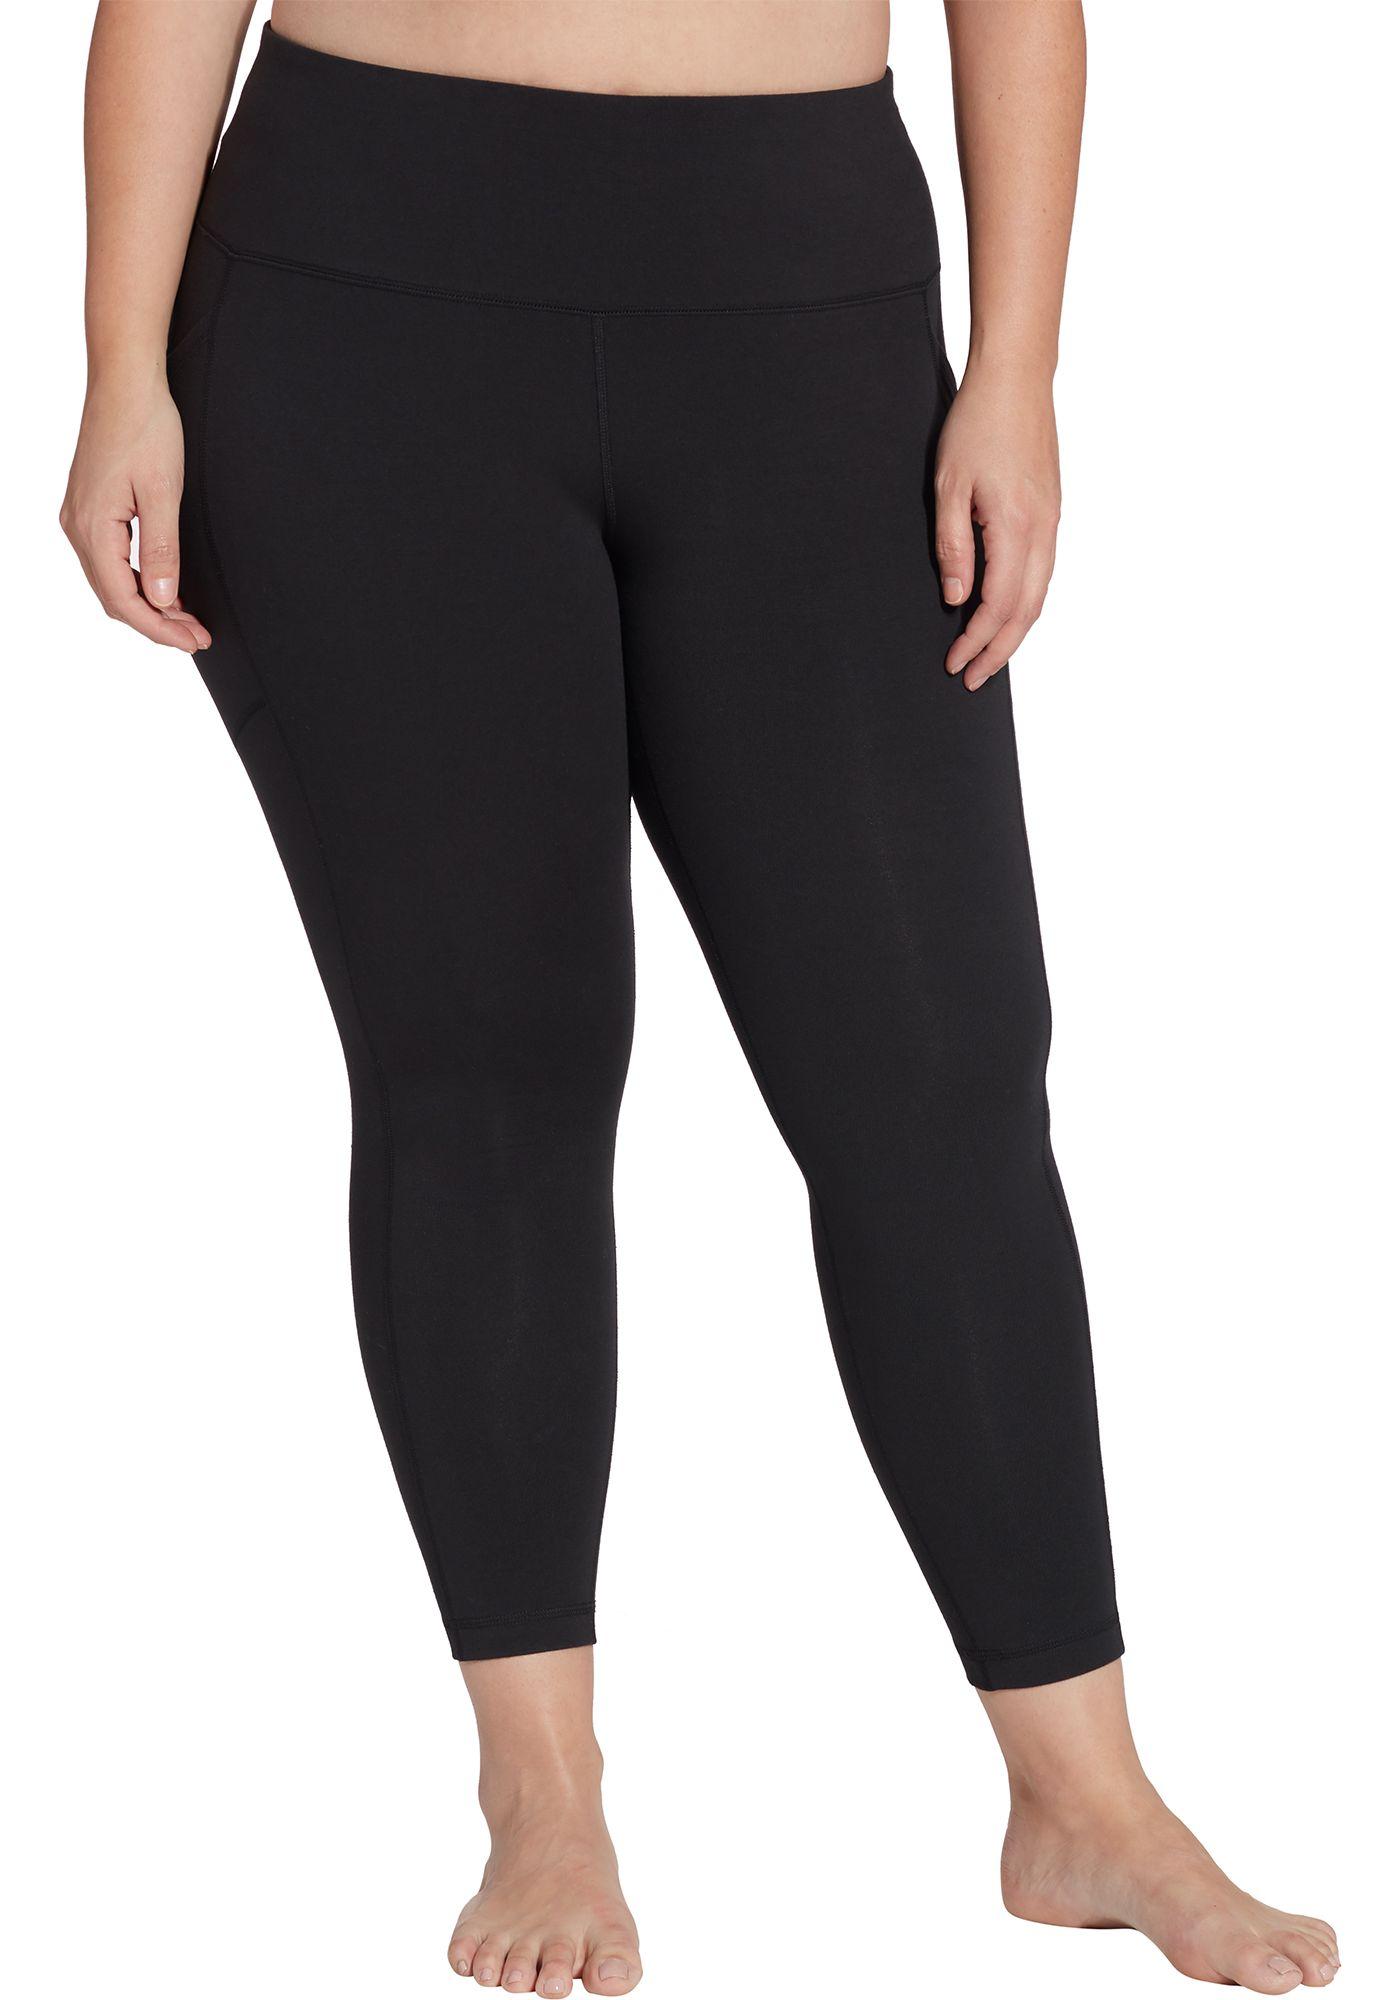 Reebok Women's Plus Size Stretch Cotton Ankle 7/8 Tights